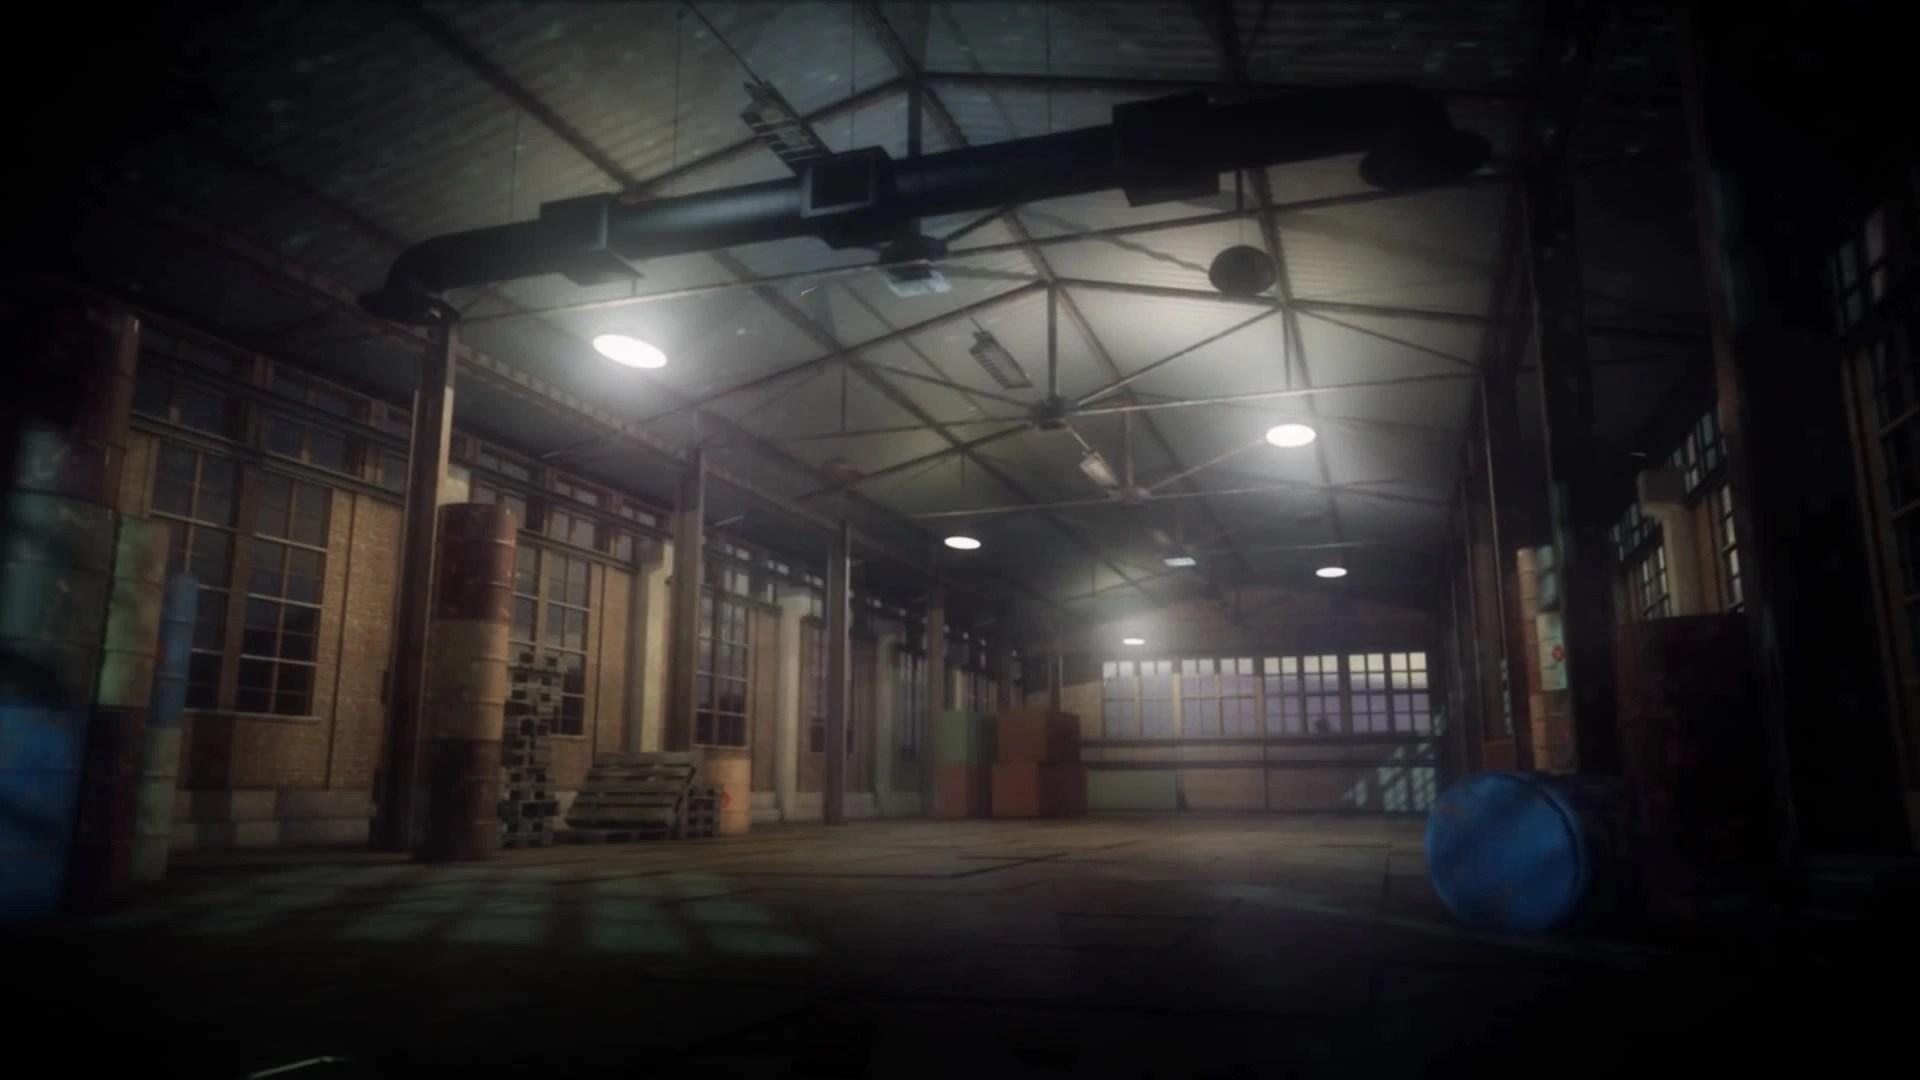 Metro 2033 Wallpaper Hd Capone S Warehouse Epic Rap Battles Of History Wiki